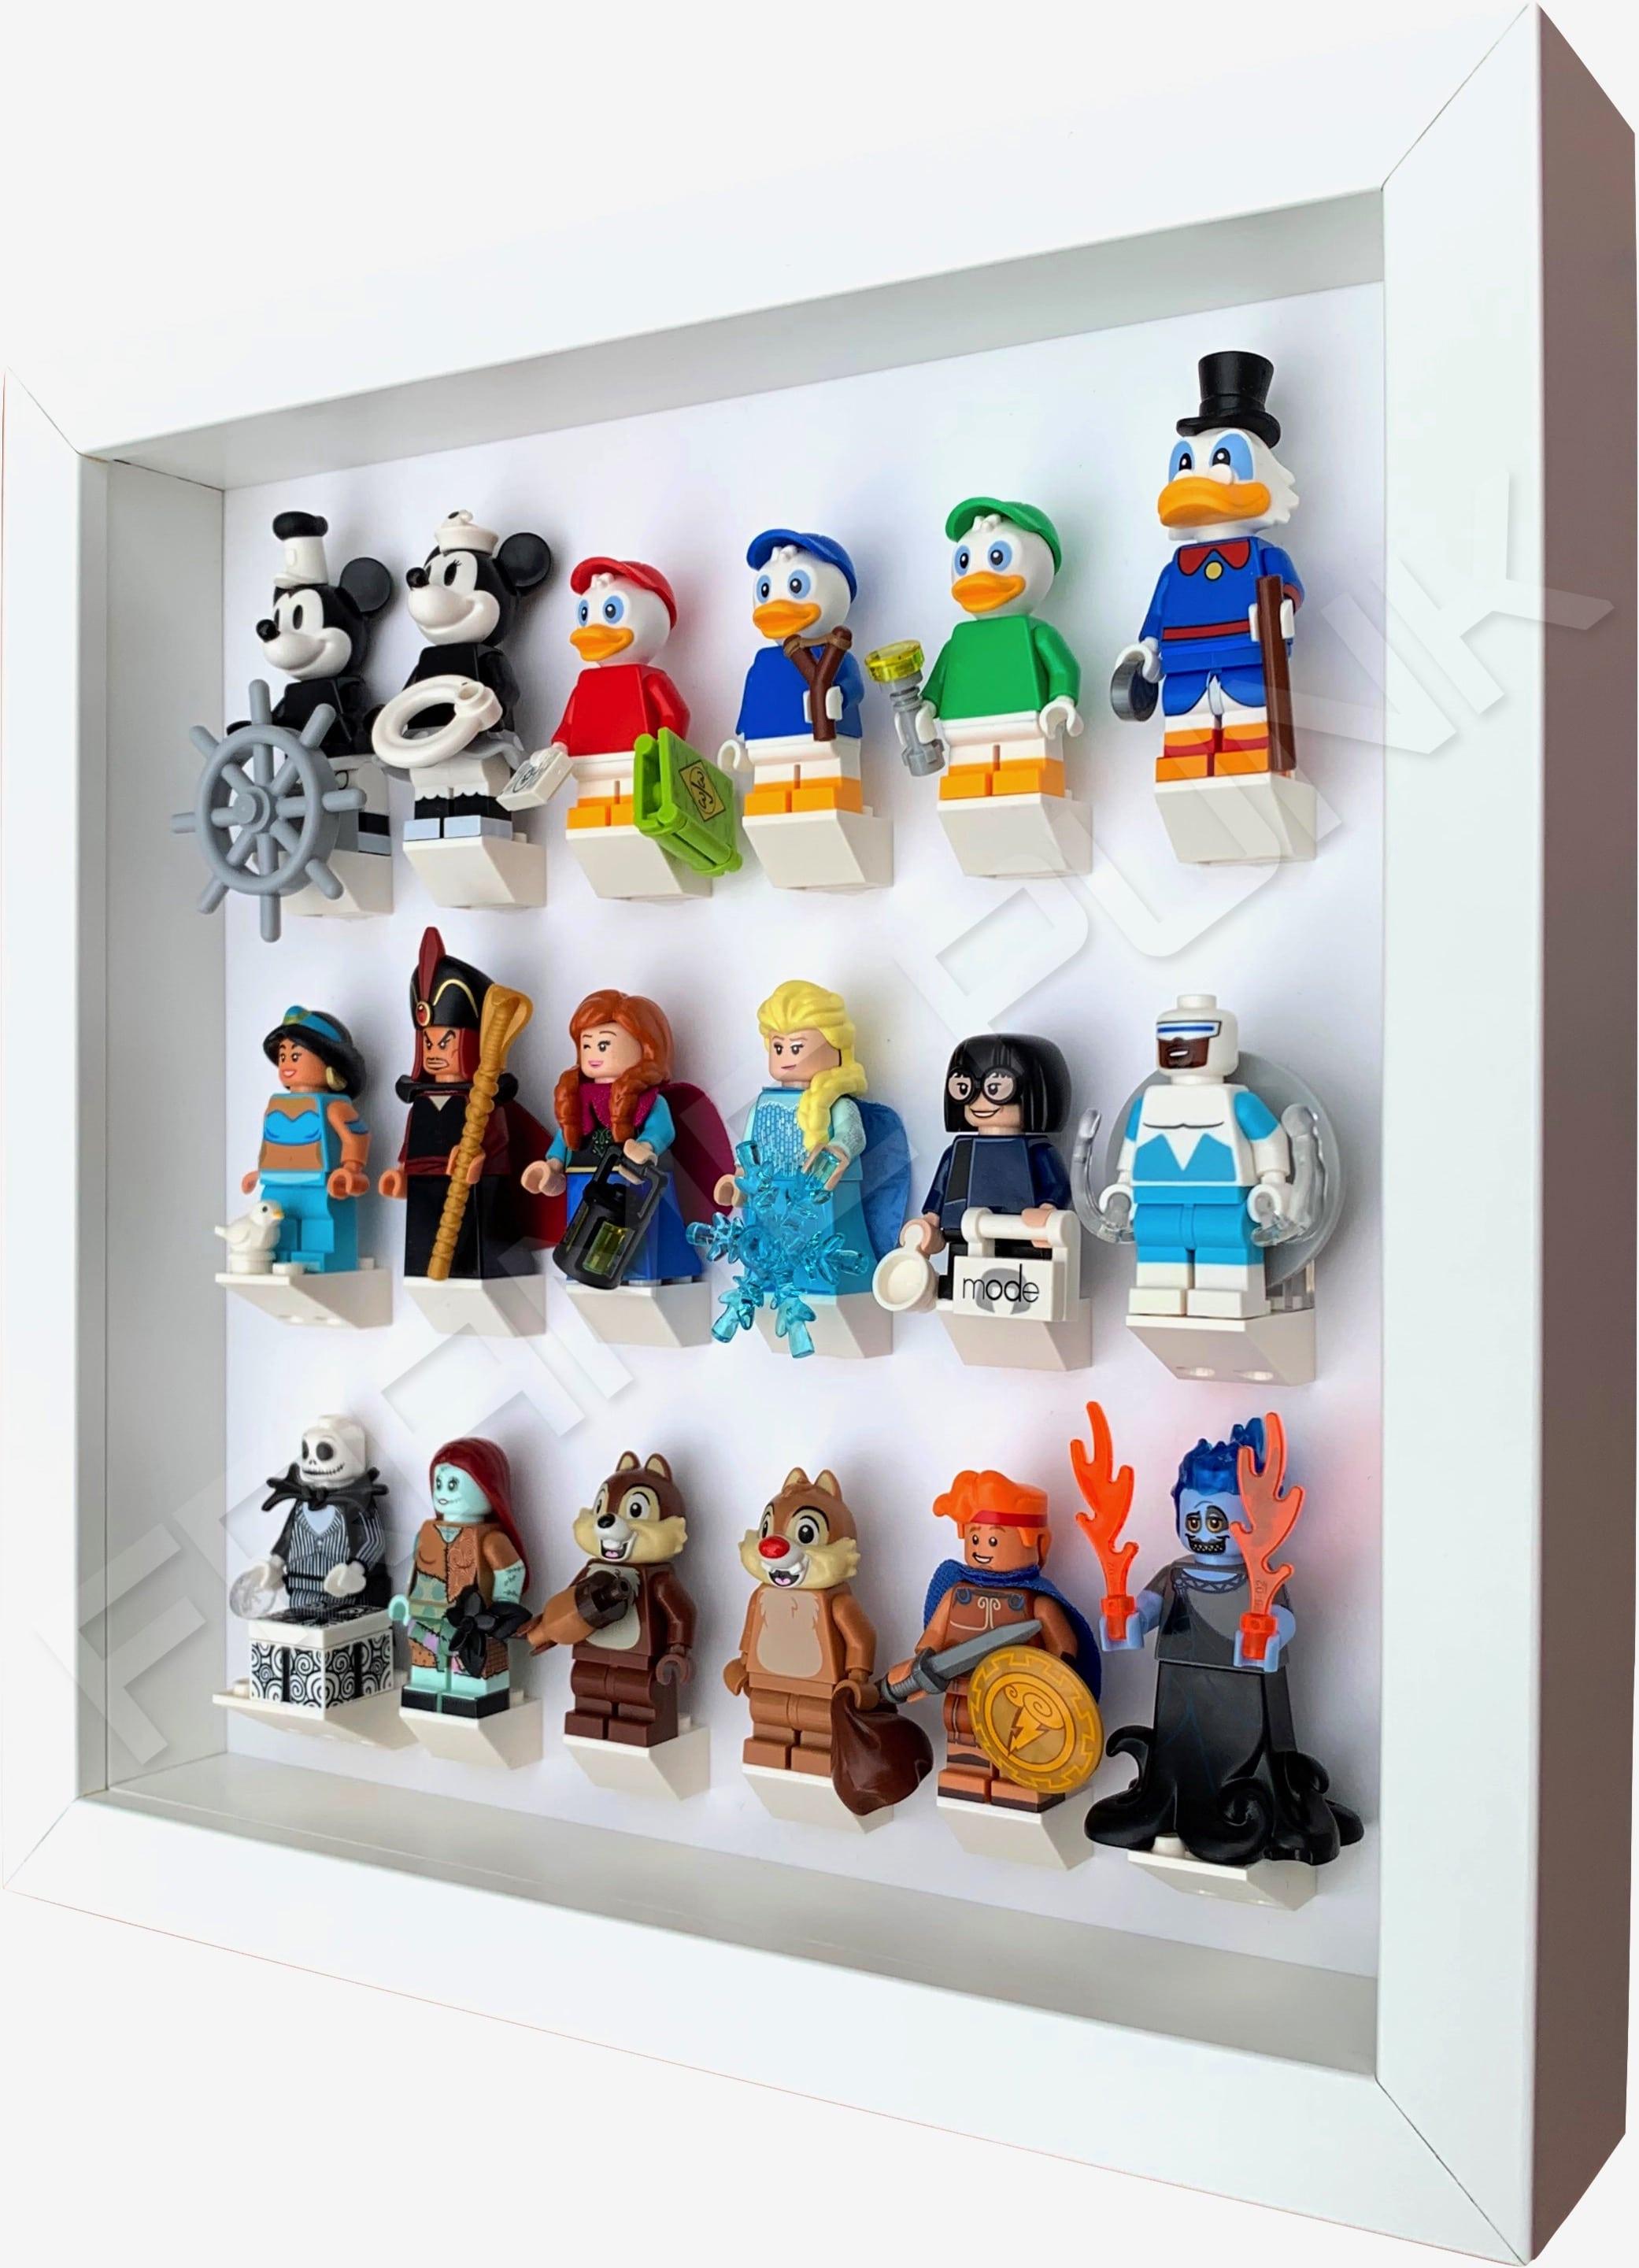 Lego Disney Series 2 Display All White Frame Punk